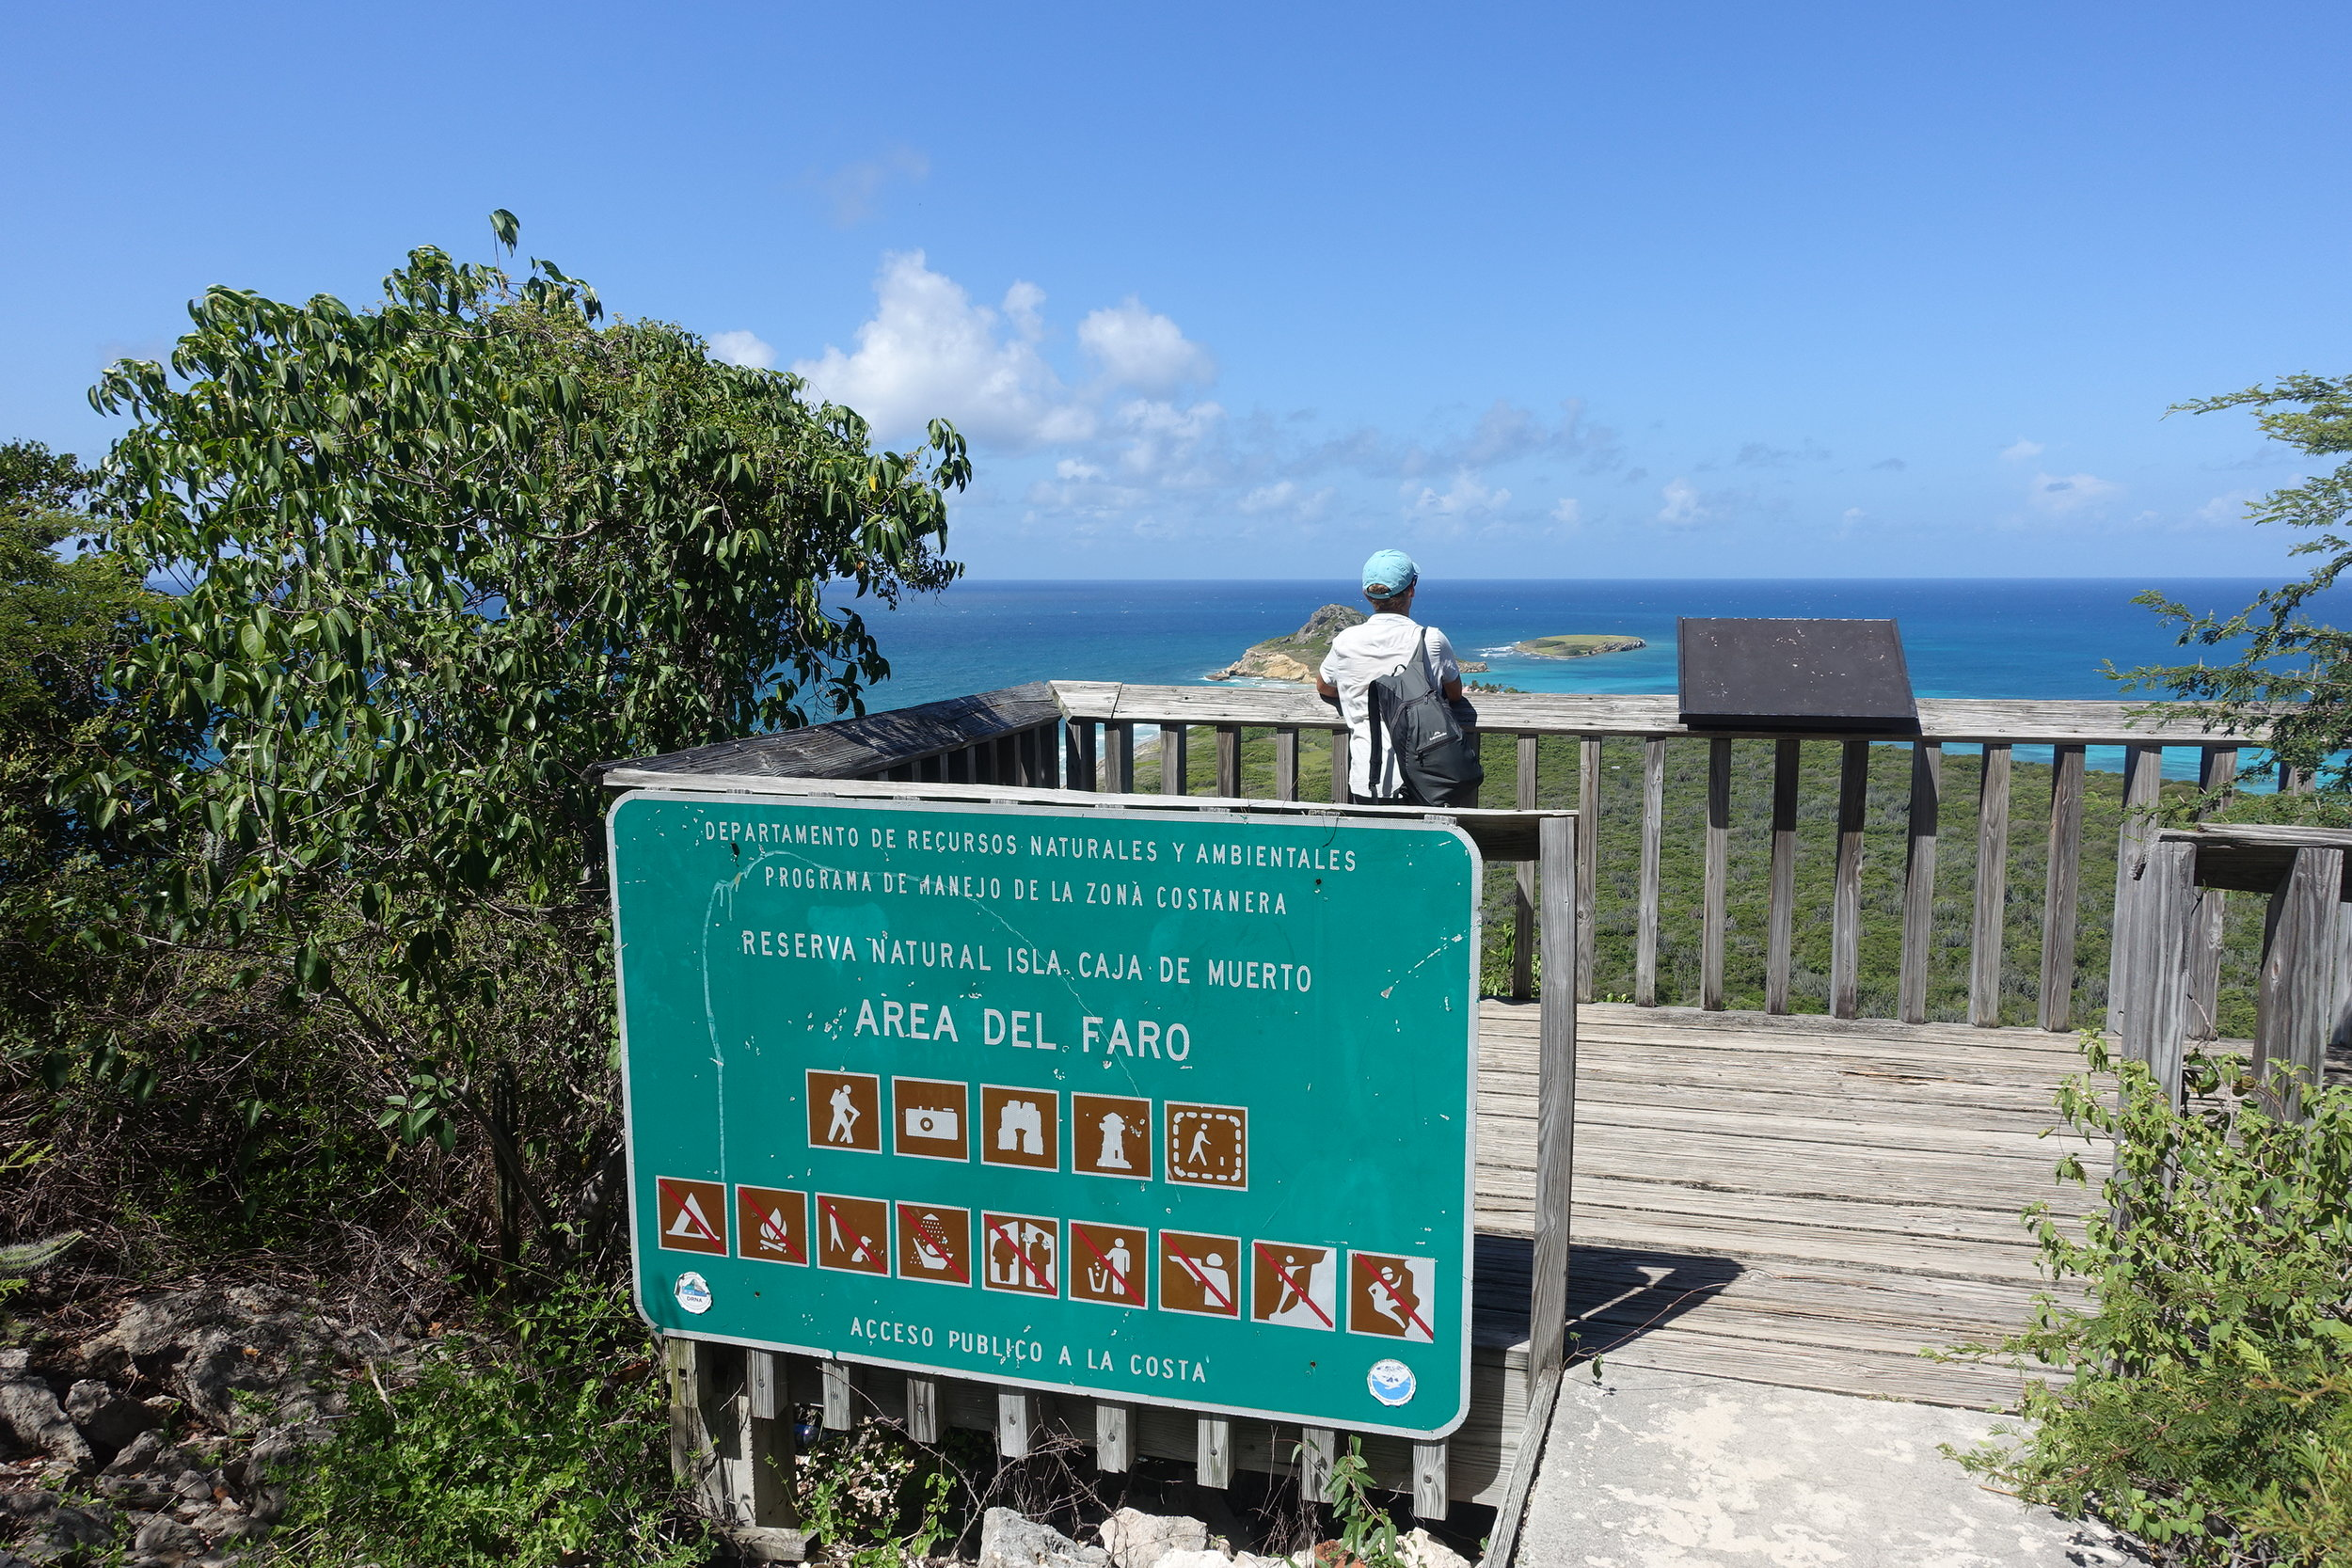 Isla caja de muerto from the lighthouse